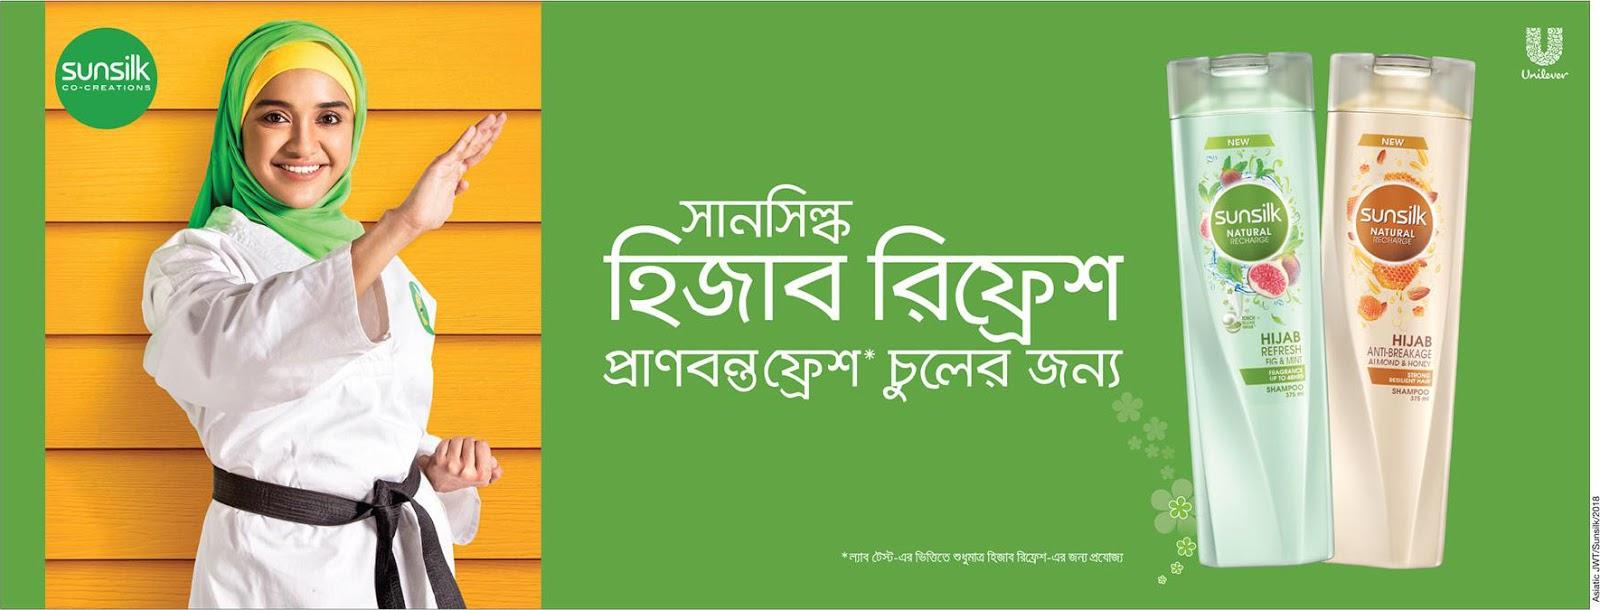 Sunsilk Shampoo Ad Cast